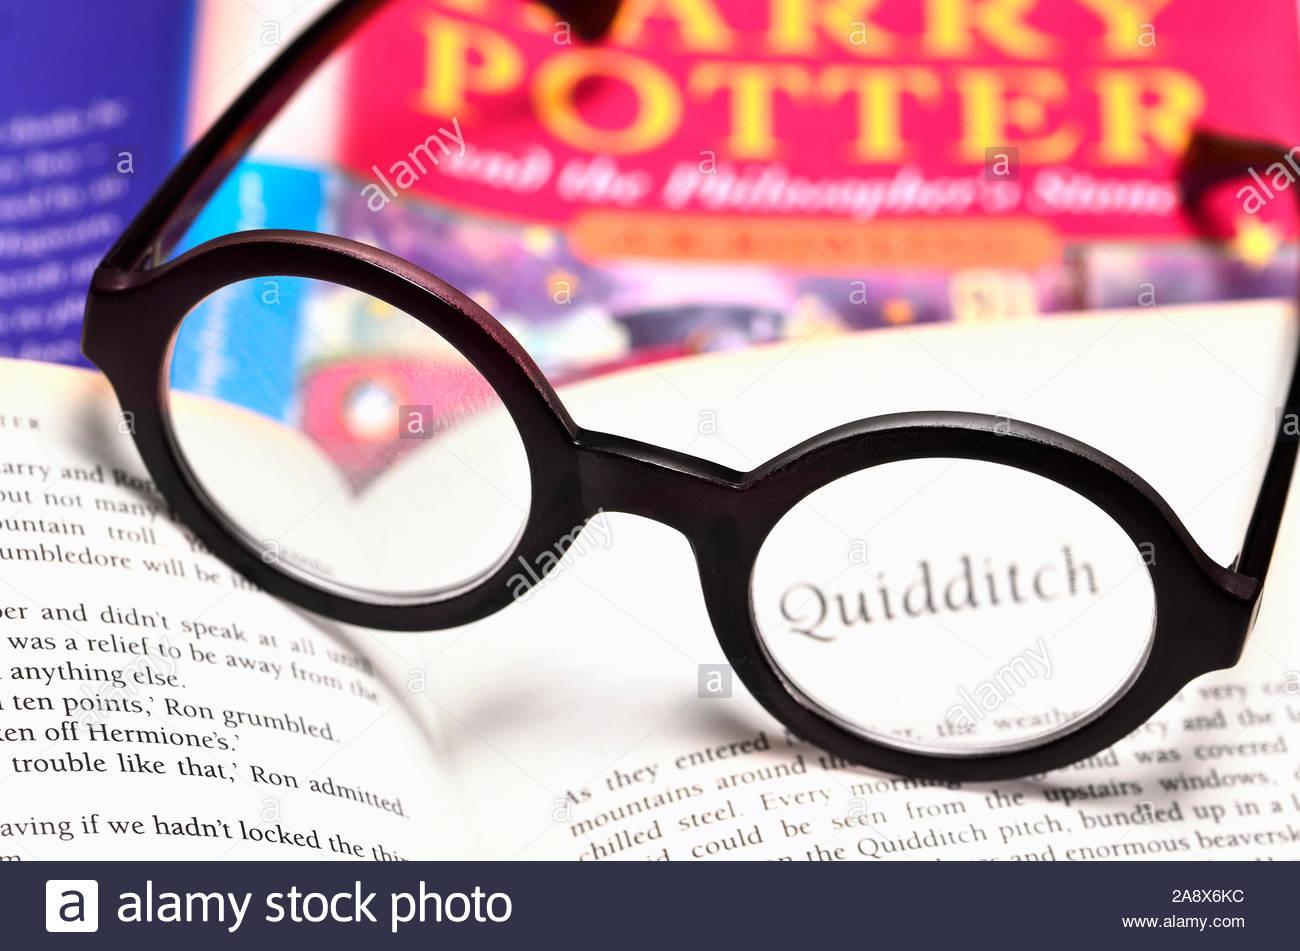 Harry Potter Nero Rotondo Occhiali Geek procedura guidata di Hogwarts Nerd Costume